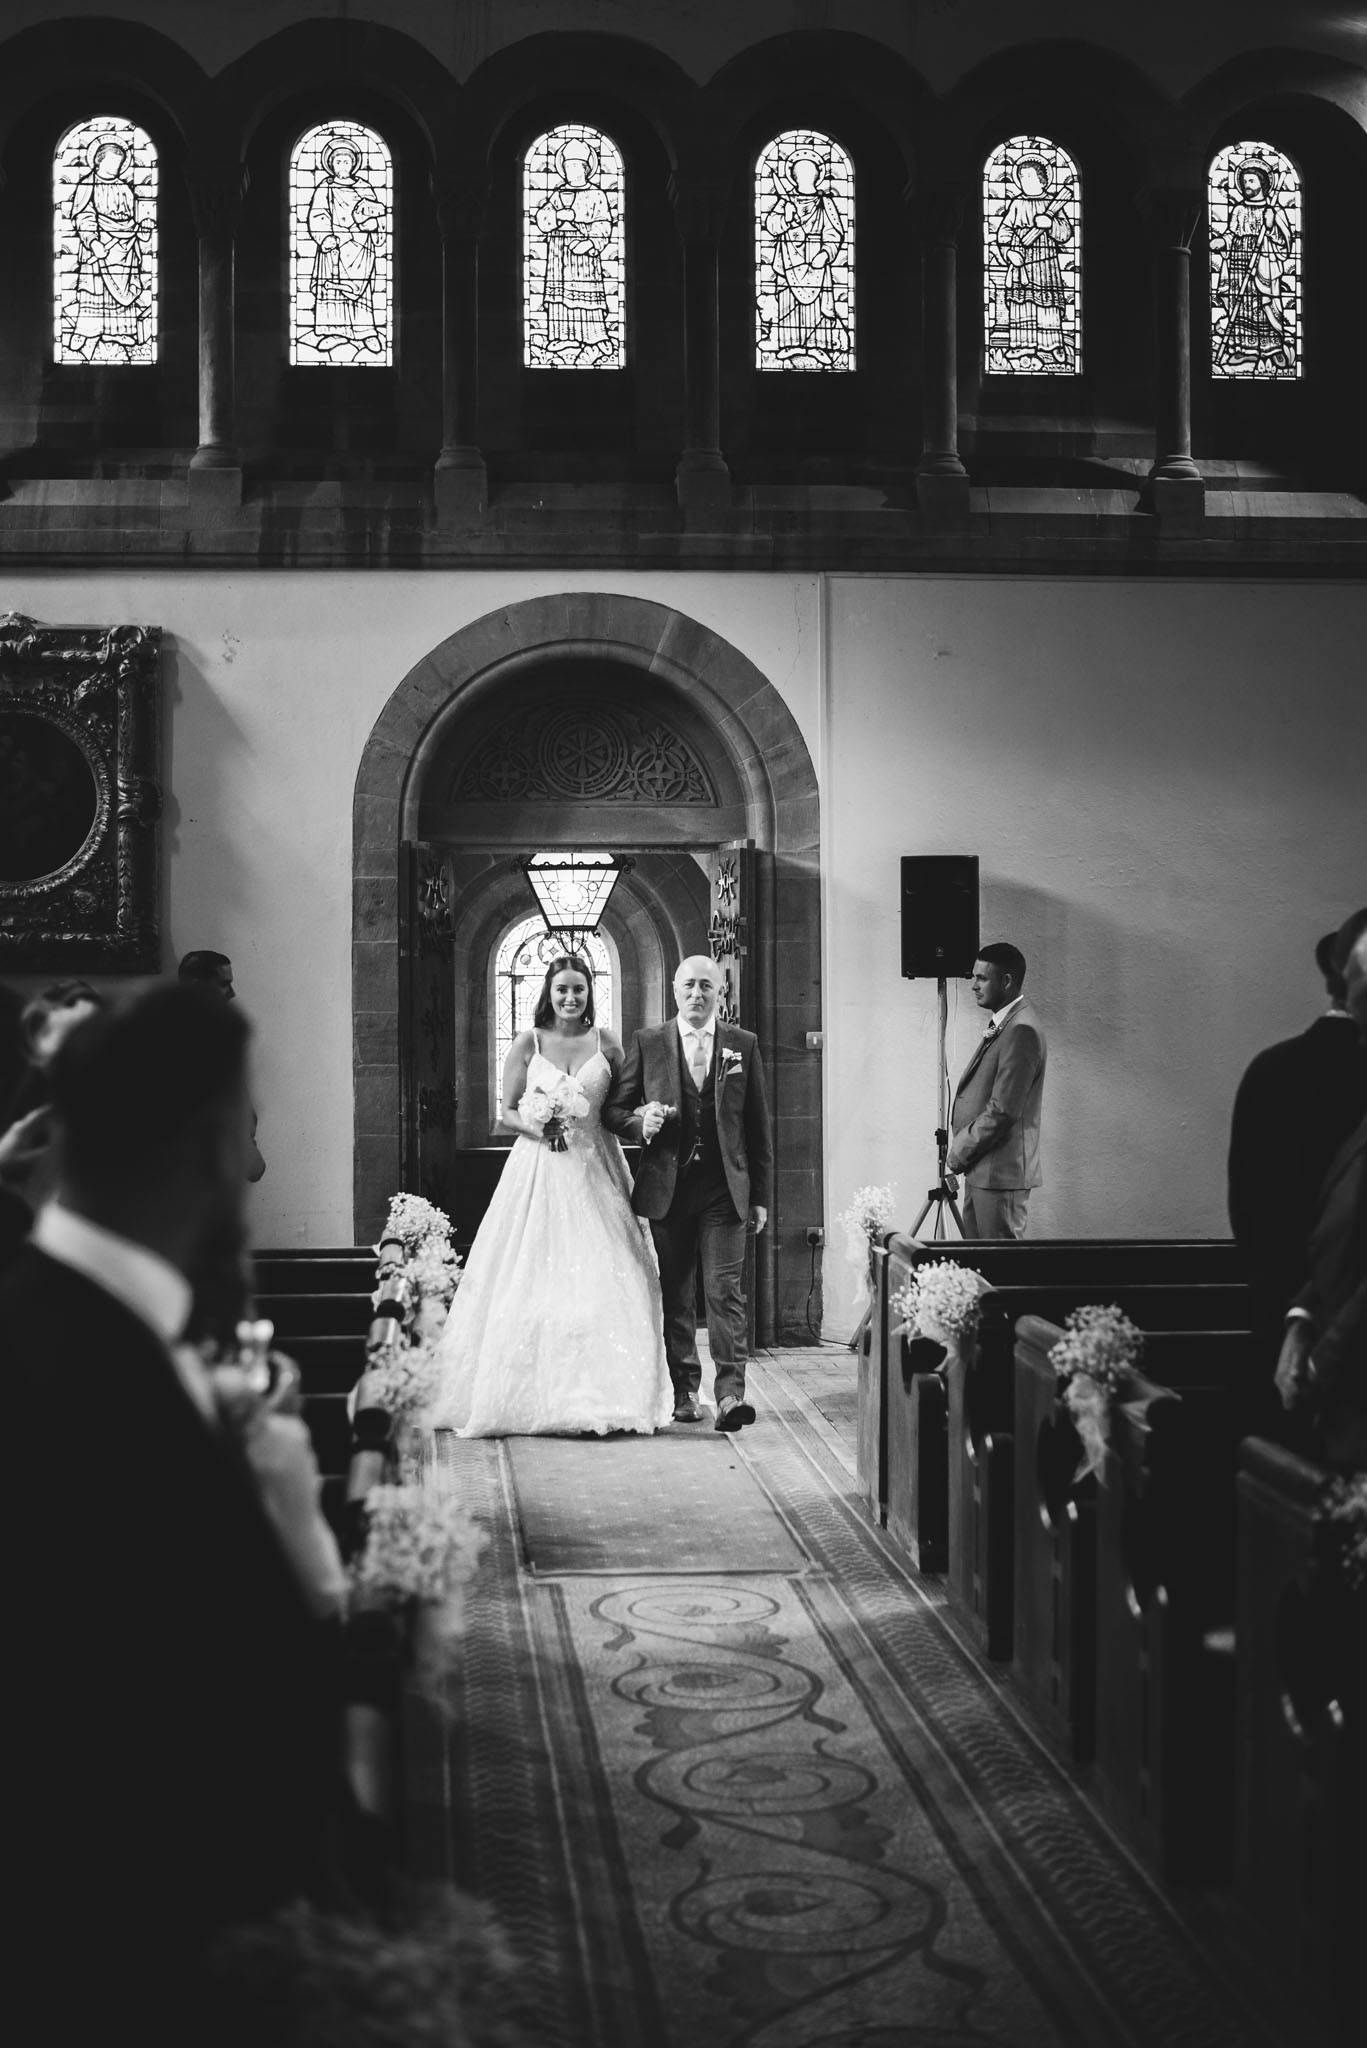 wedding-photographer-glewstone-court-hereford-scott-stockwell-photography162.jpg